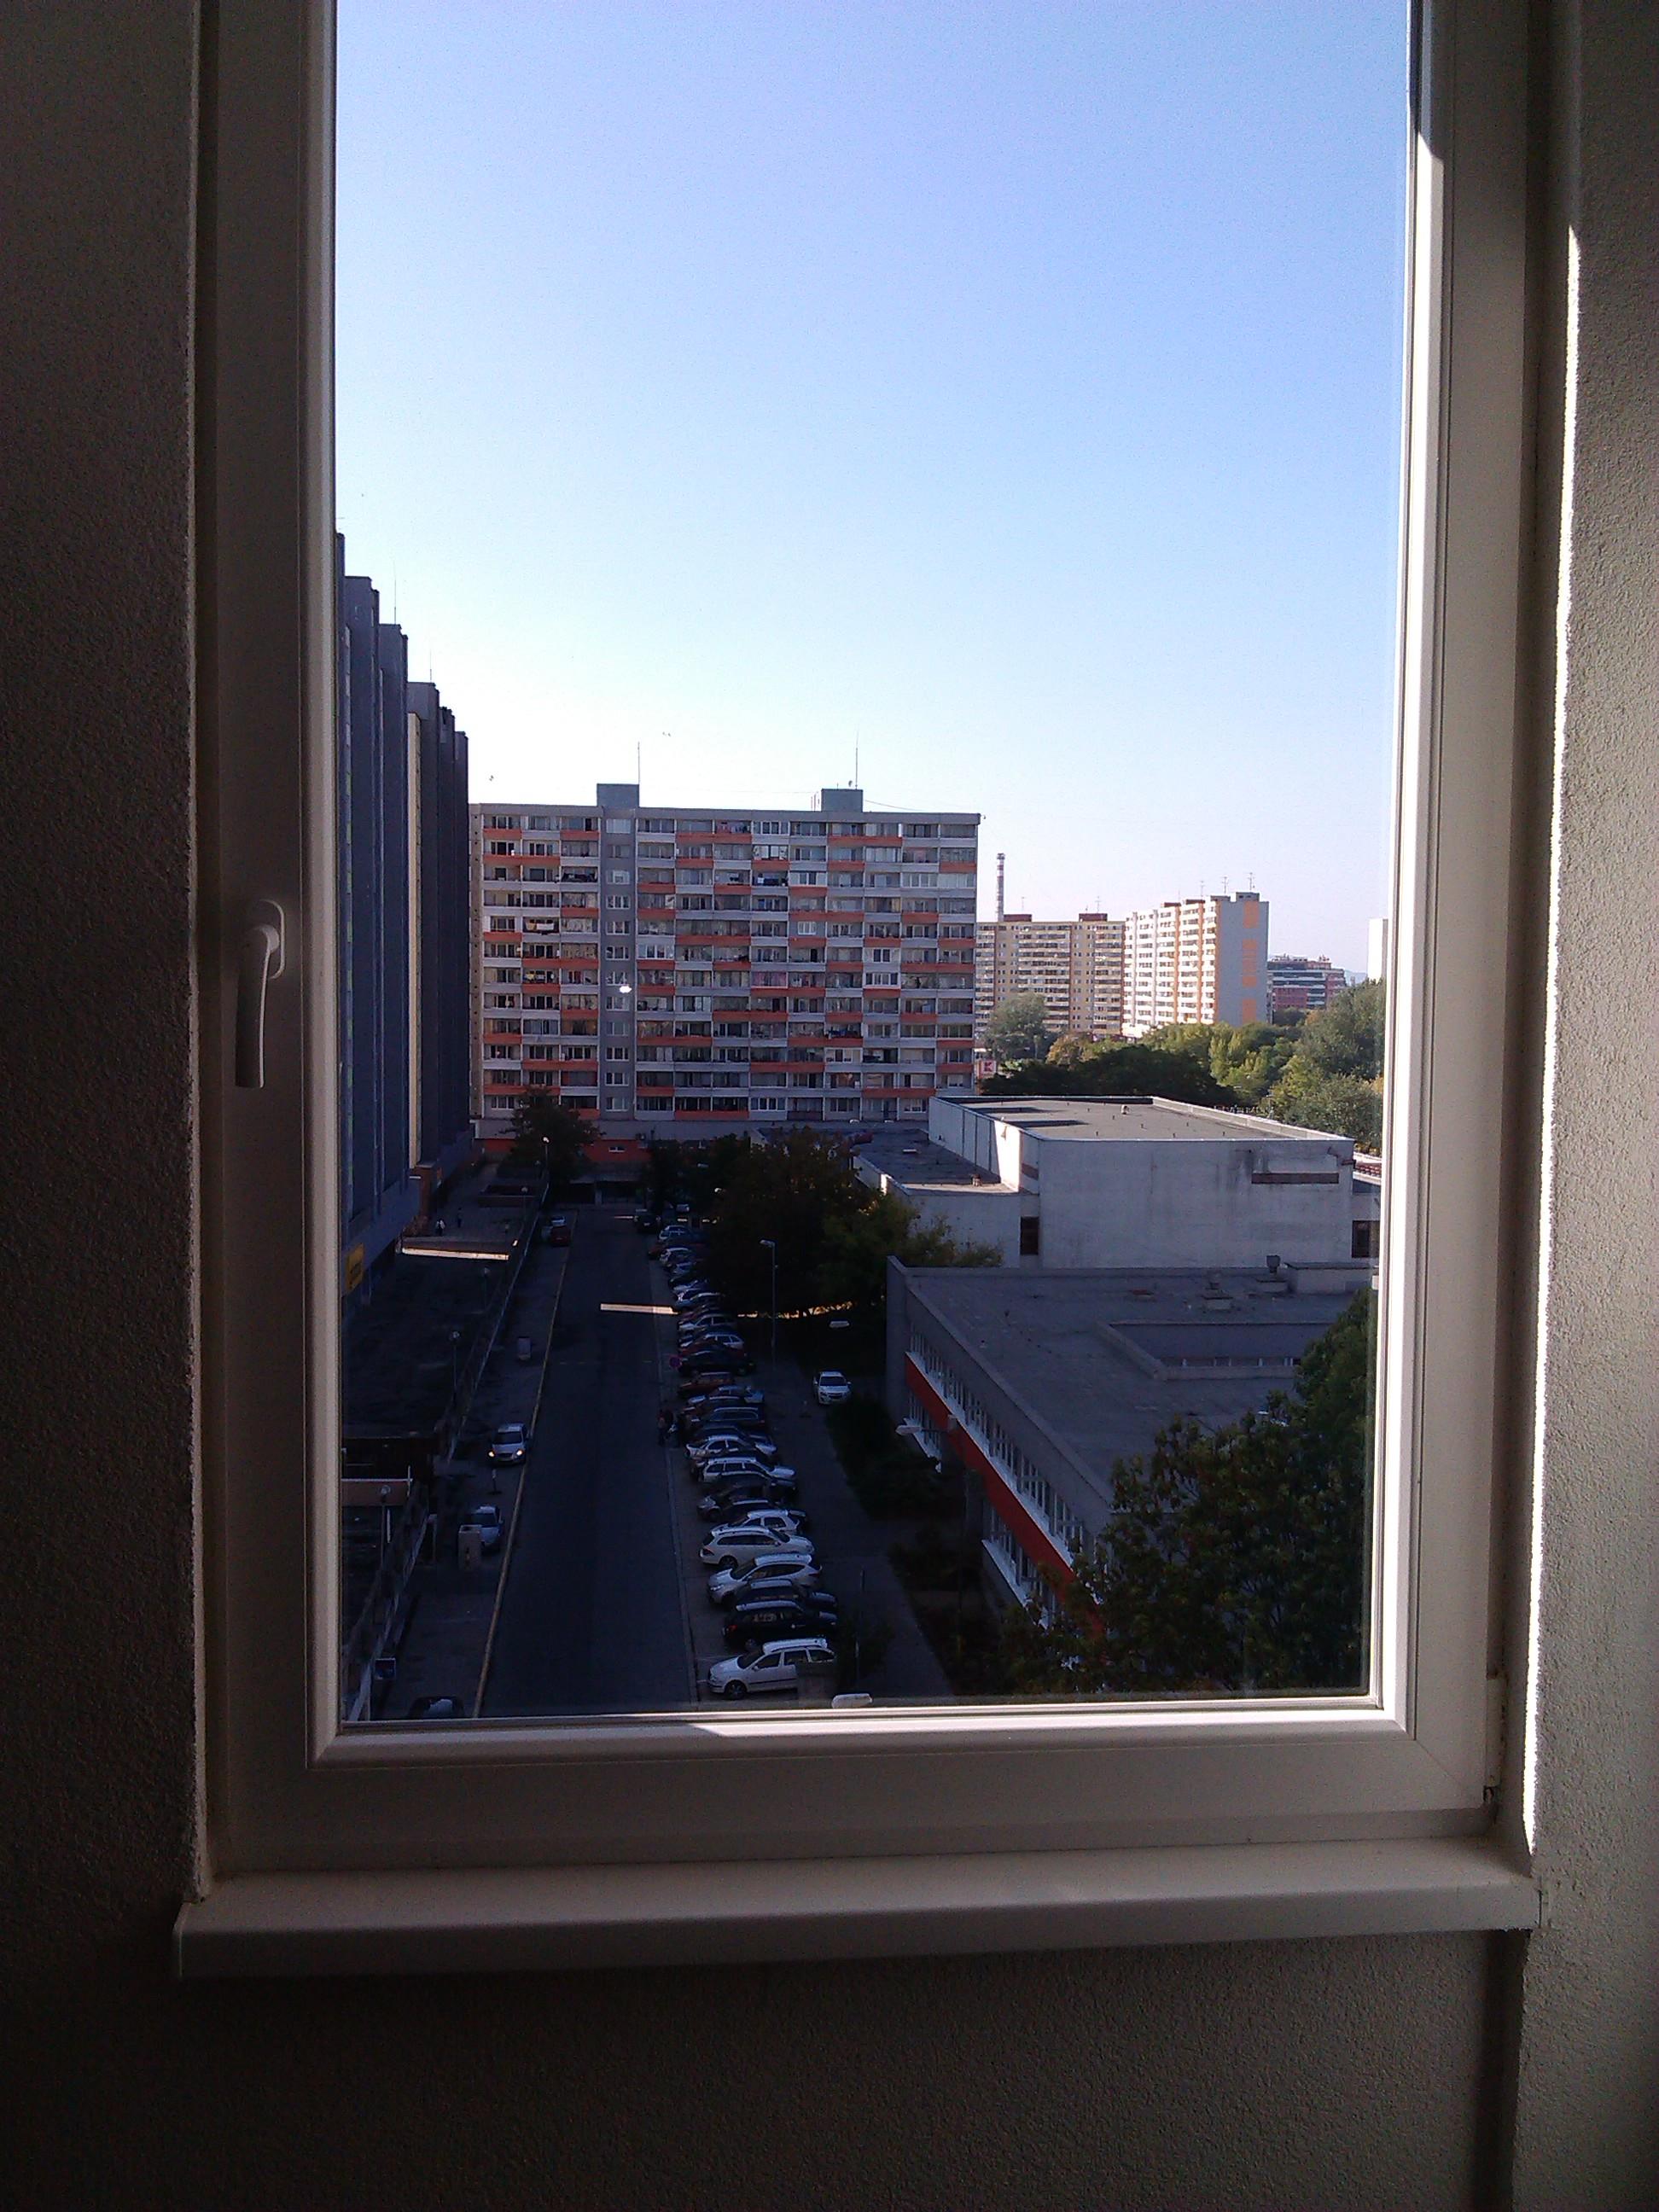 Dokonale čisté a vyleštené okná